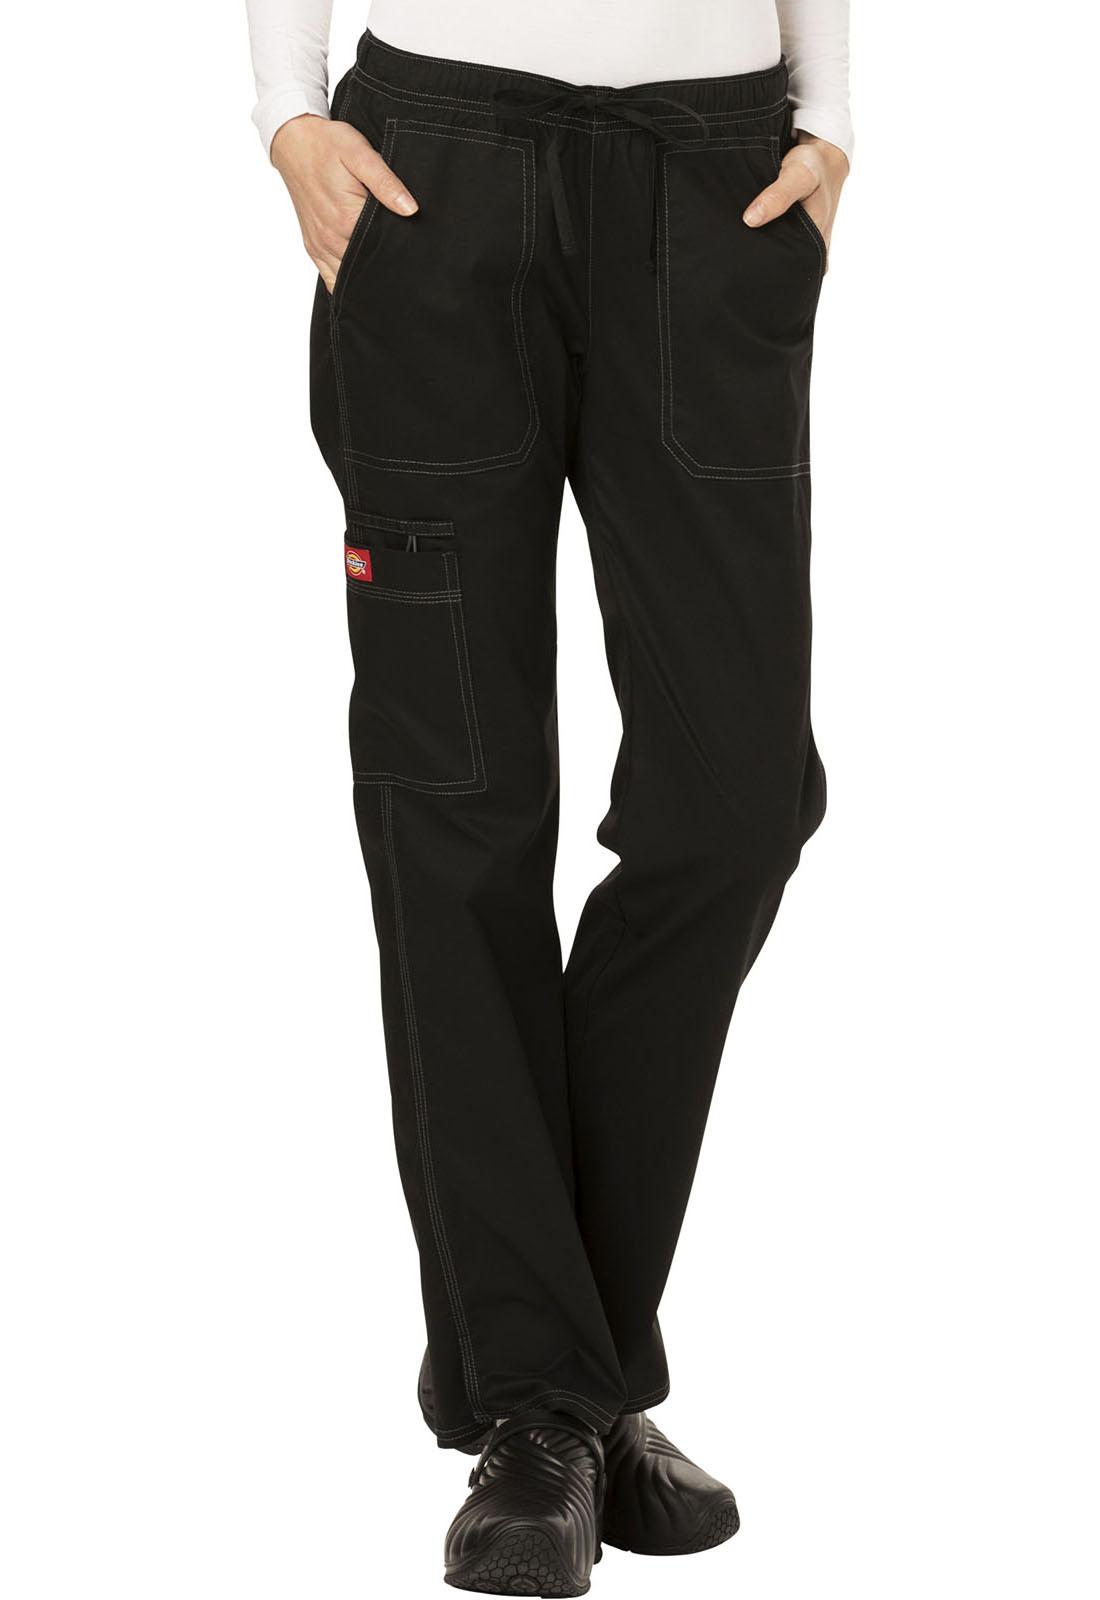 Black Heart Shape yoga pants. yoga pants for less. $ $ items left Add to Cart Collection list Leggings 34 items.